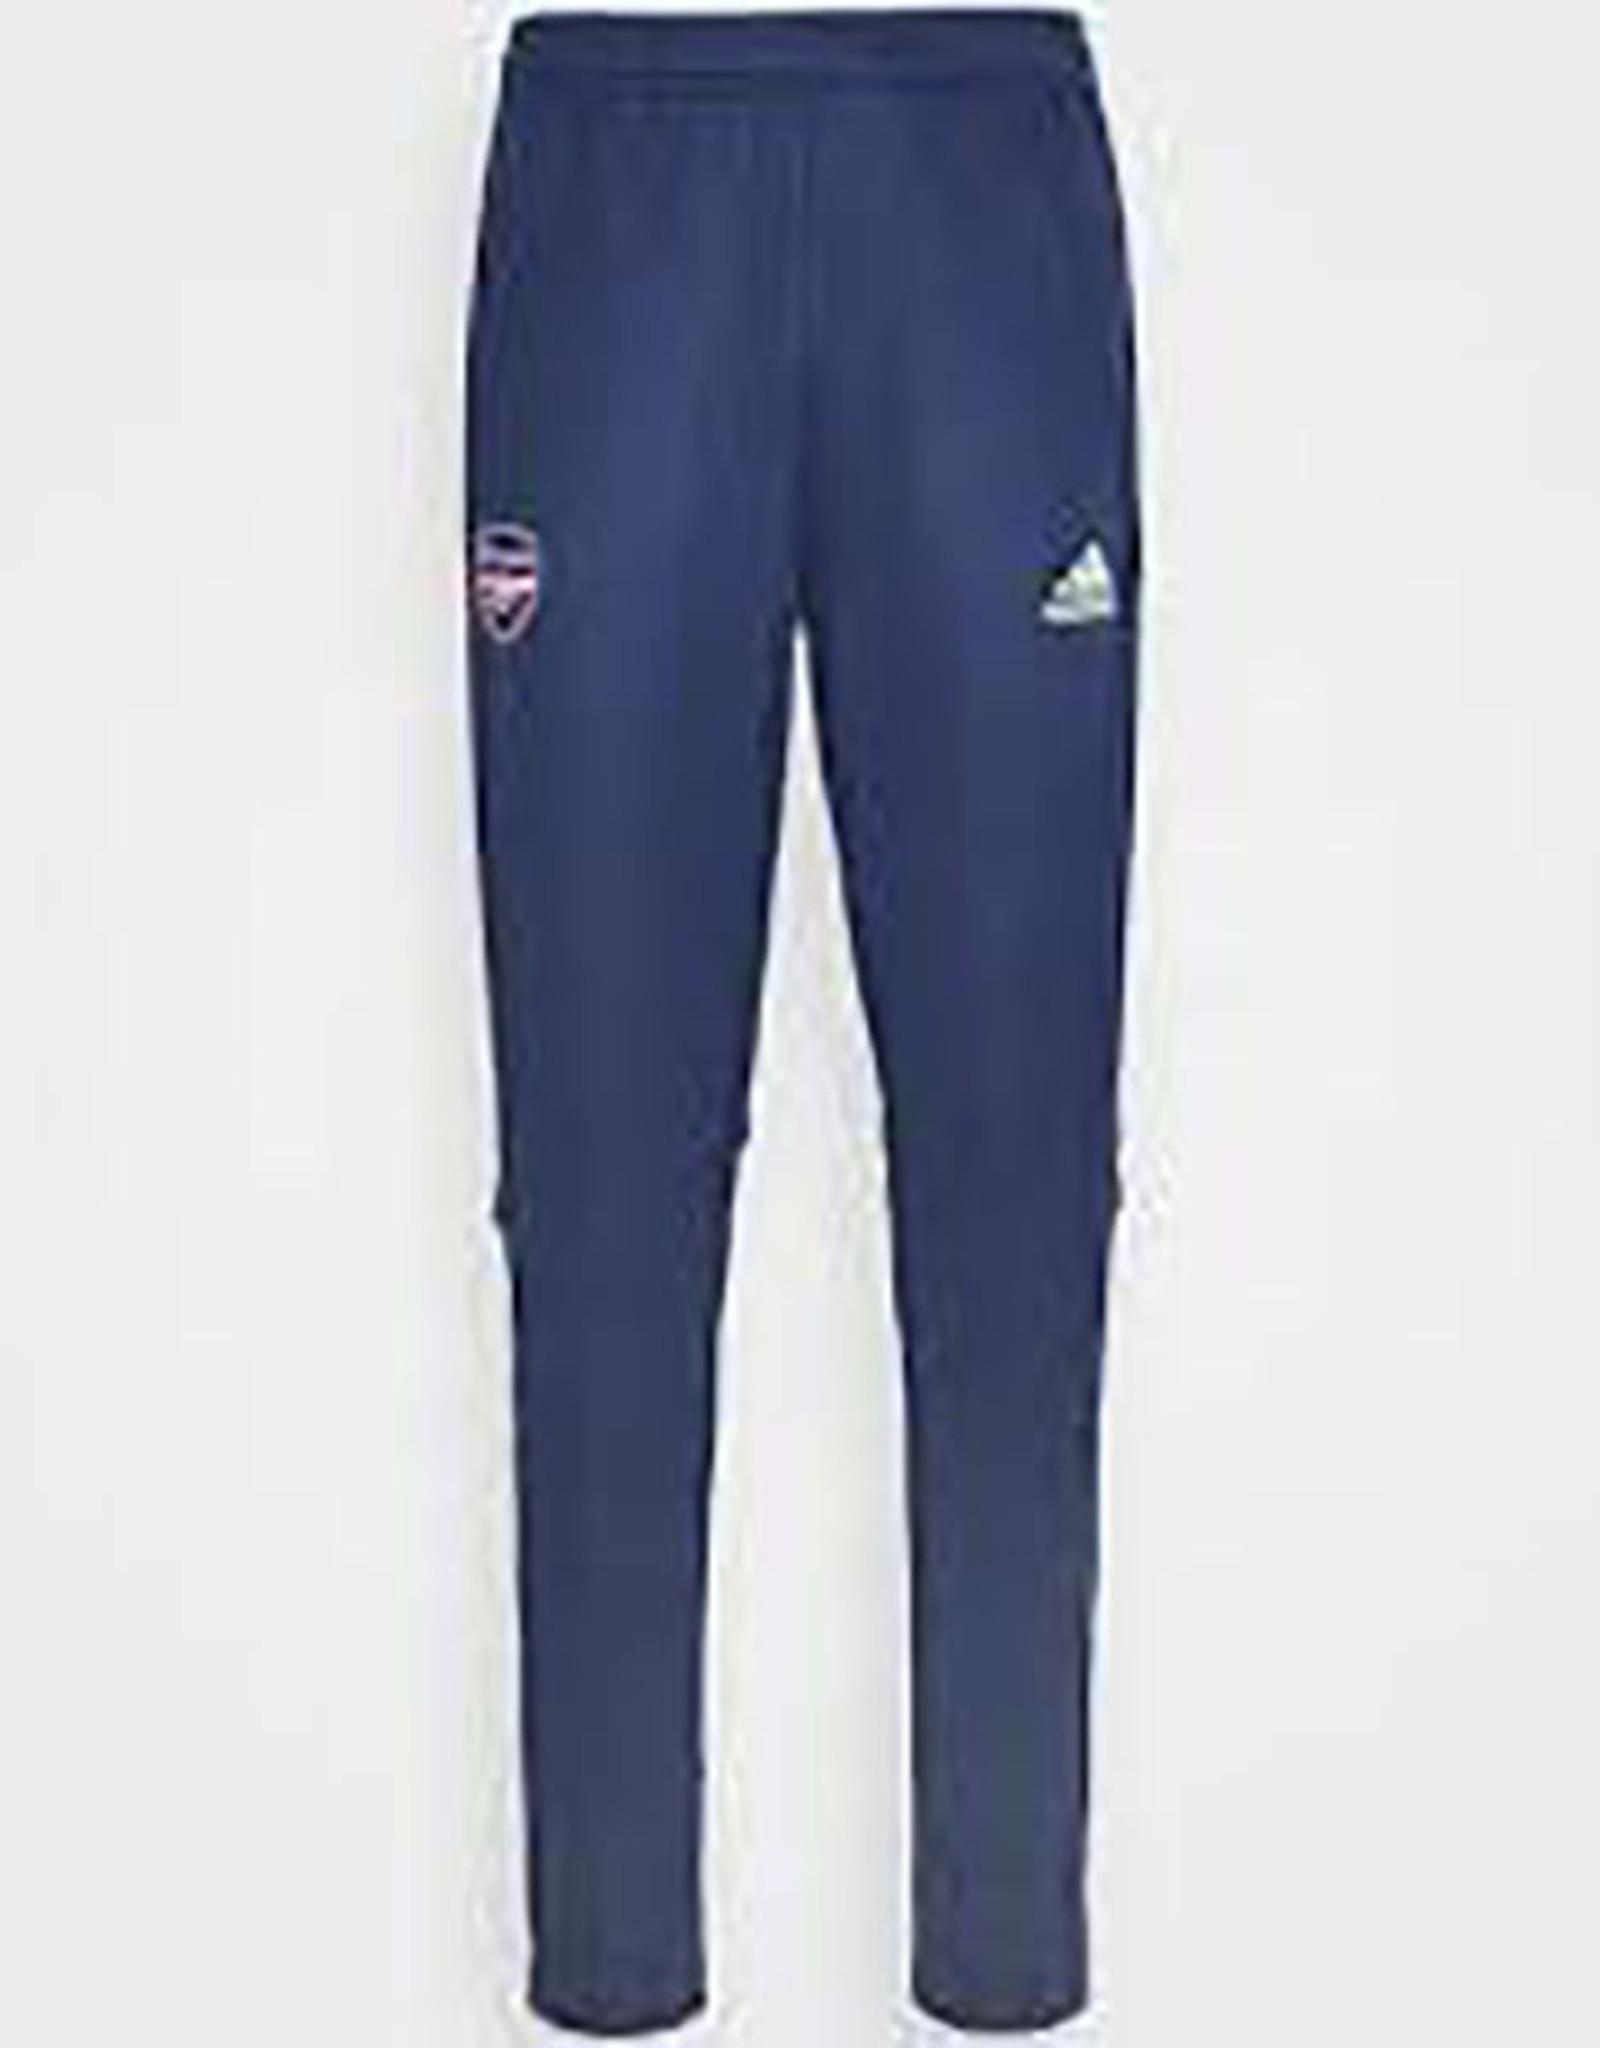 Adidas Trainingsbroek Arsenal